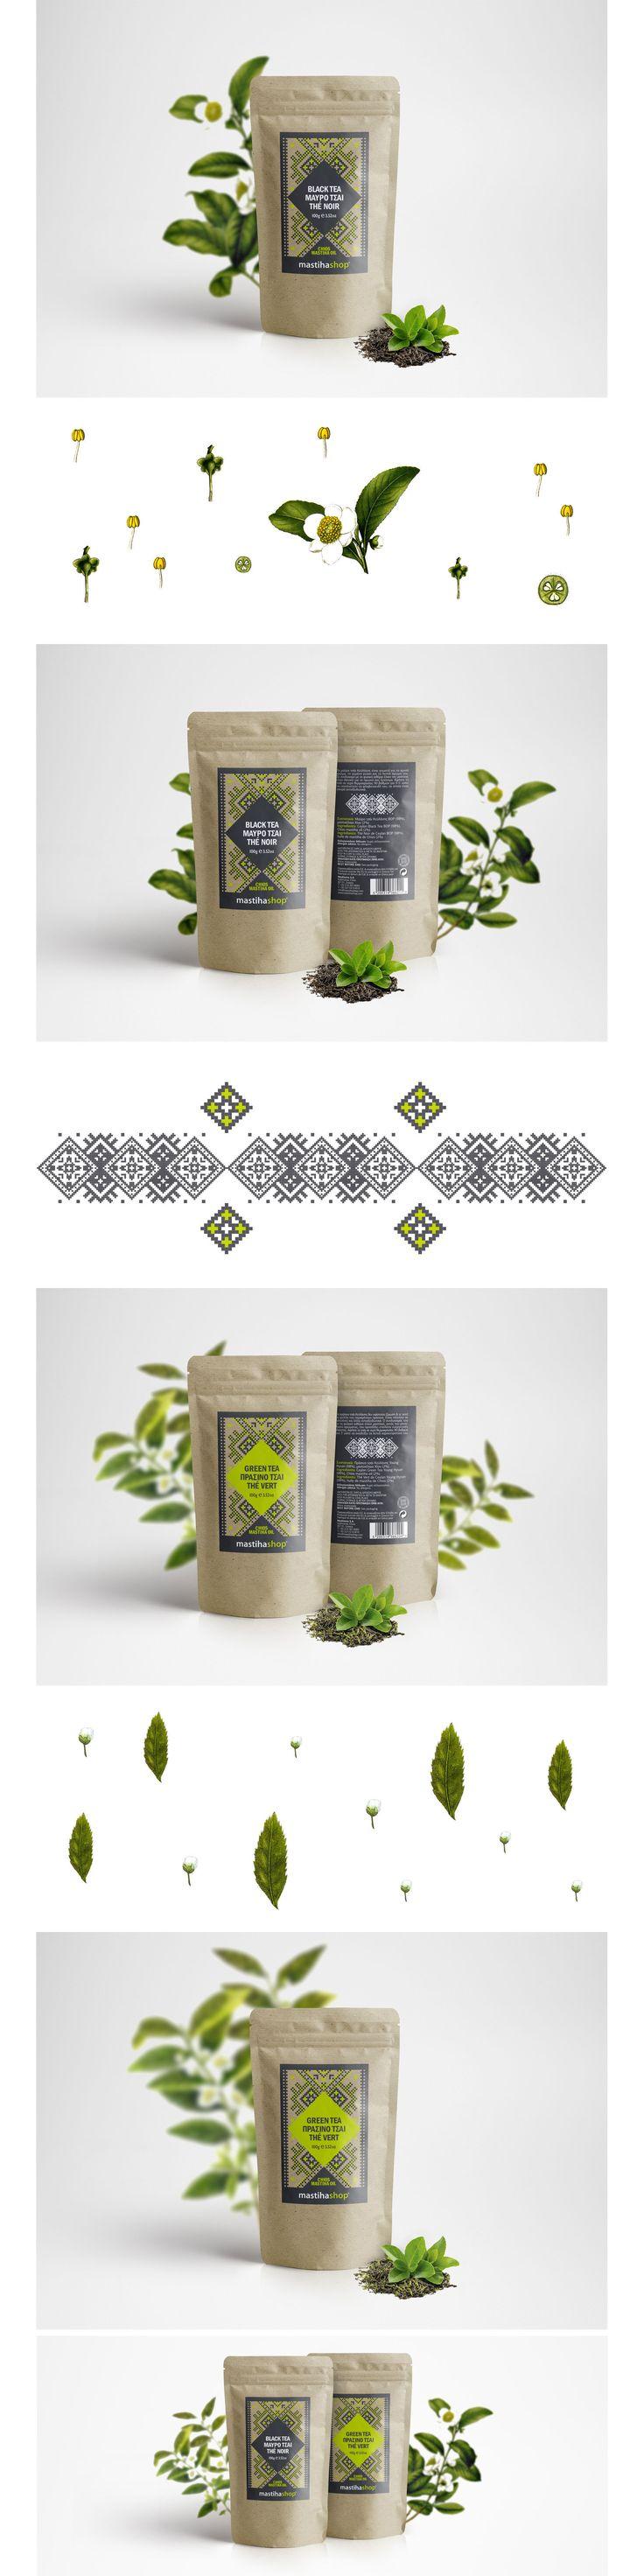 "Check out my @Behance project: ""mastihashop   Ceylon Black & Green tea   packaging"" https://www.behance.net/gallery/47348519/mastihashop-Ceylon-Black-Green-tea-packaging"